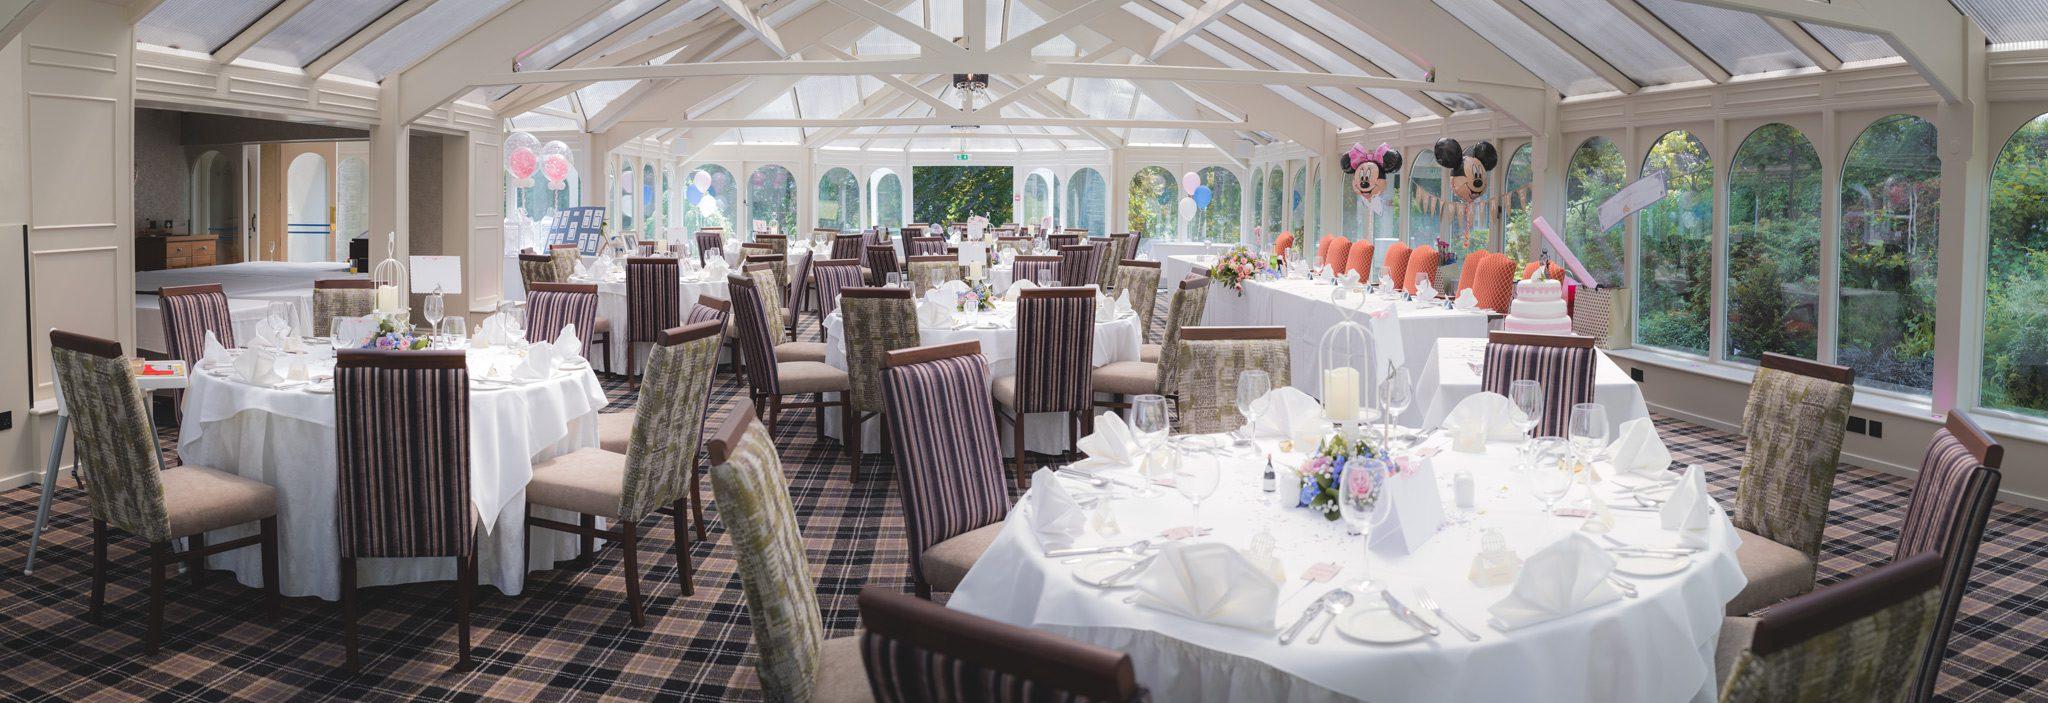 The Leewood Hotel Wedding